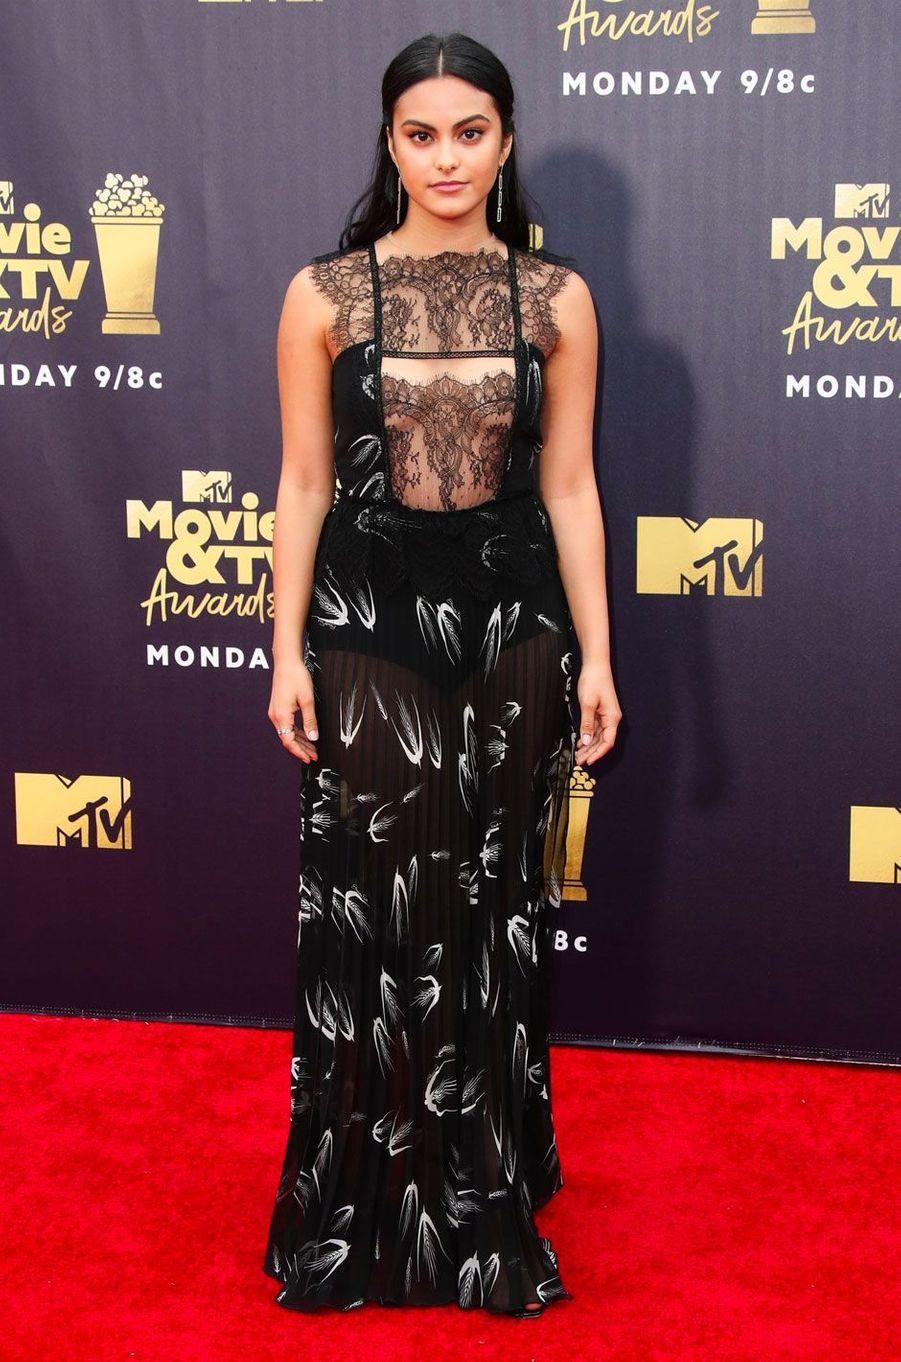 Camila Mendes aux MTV Movie Awards le 16 juin 2018